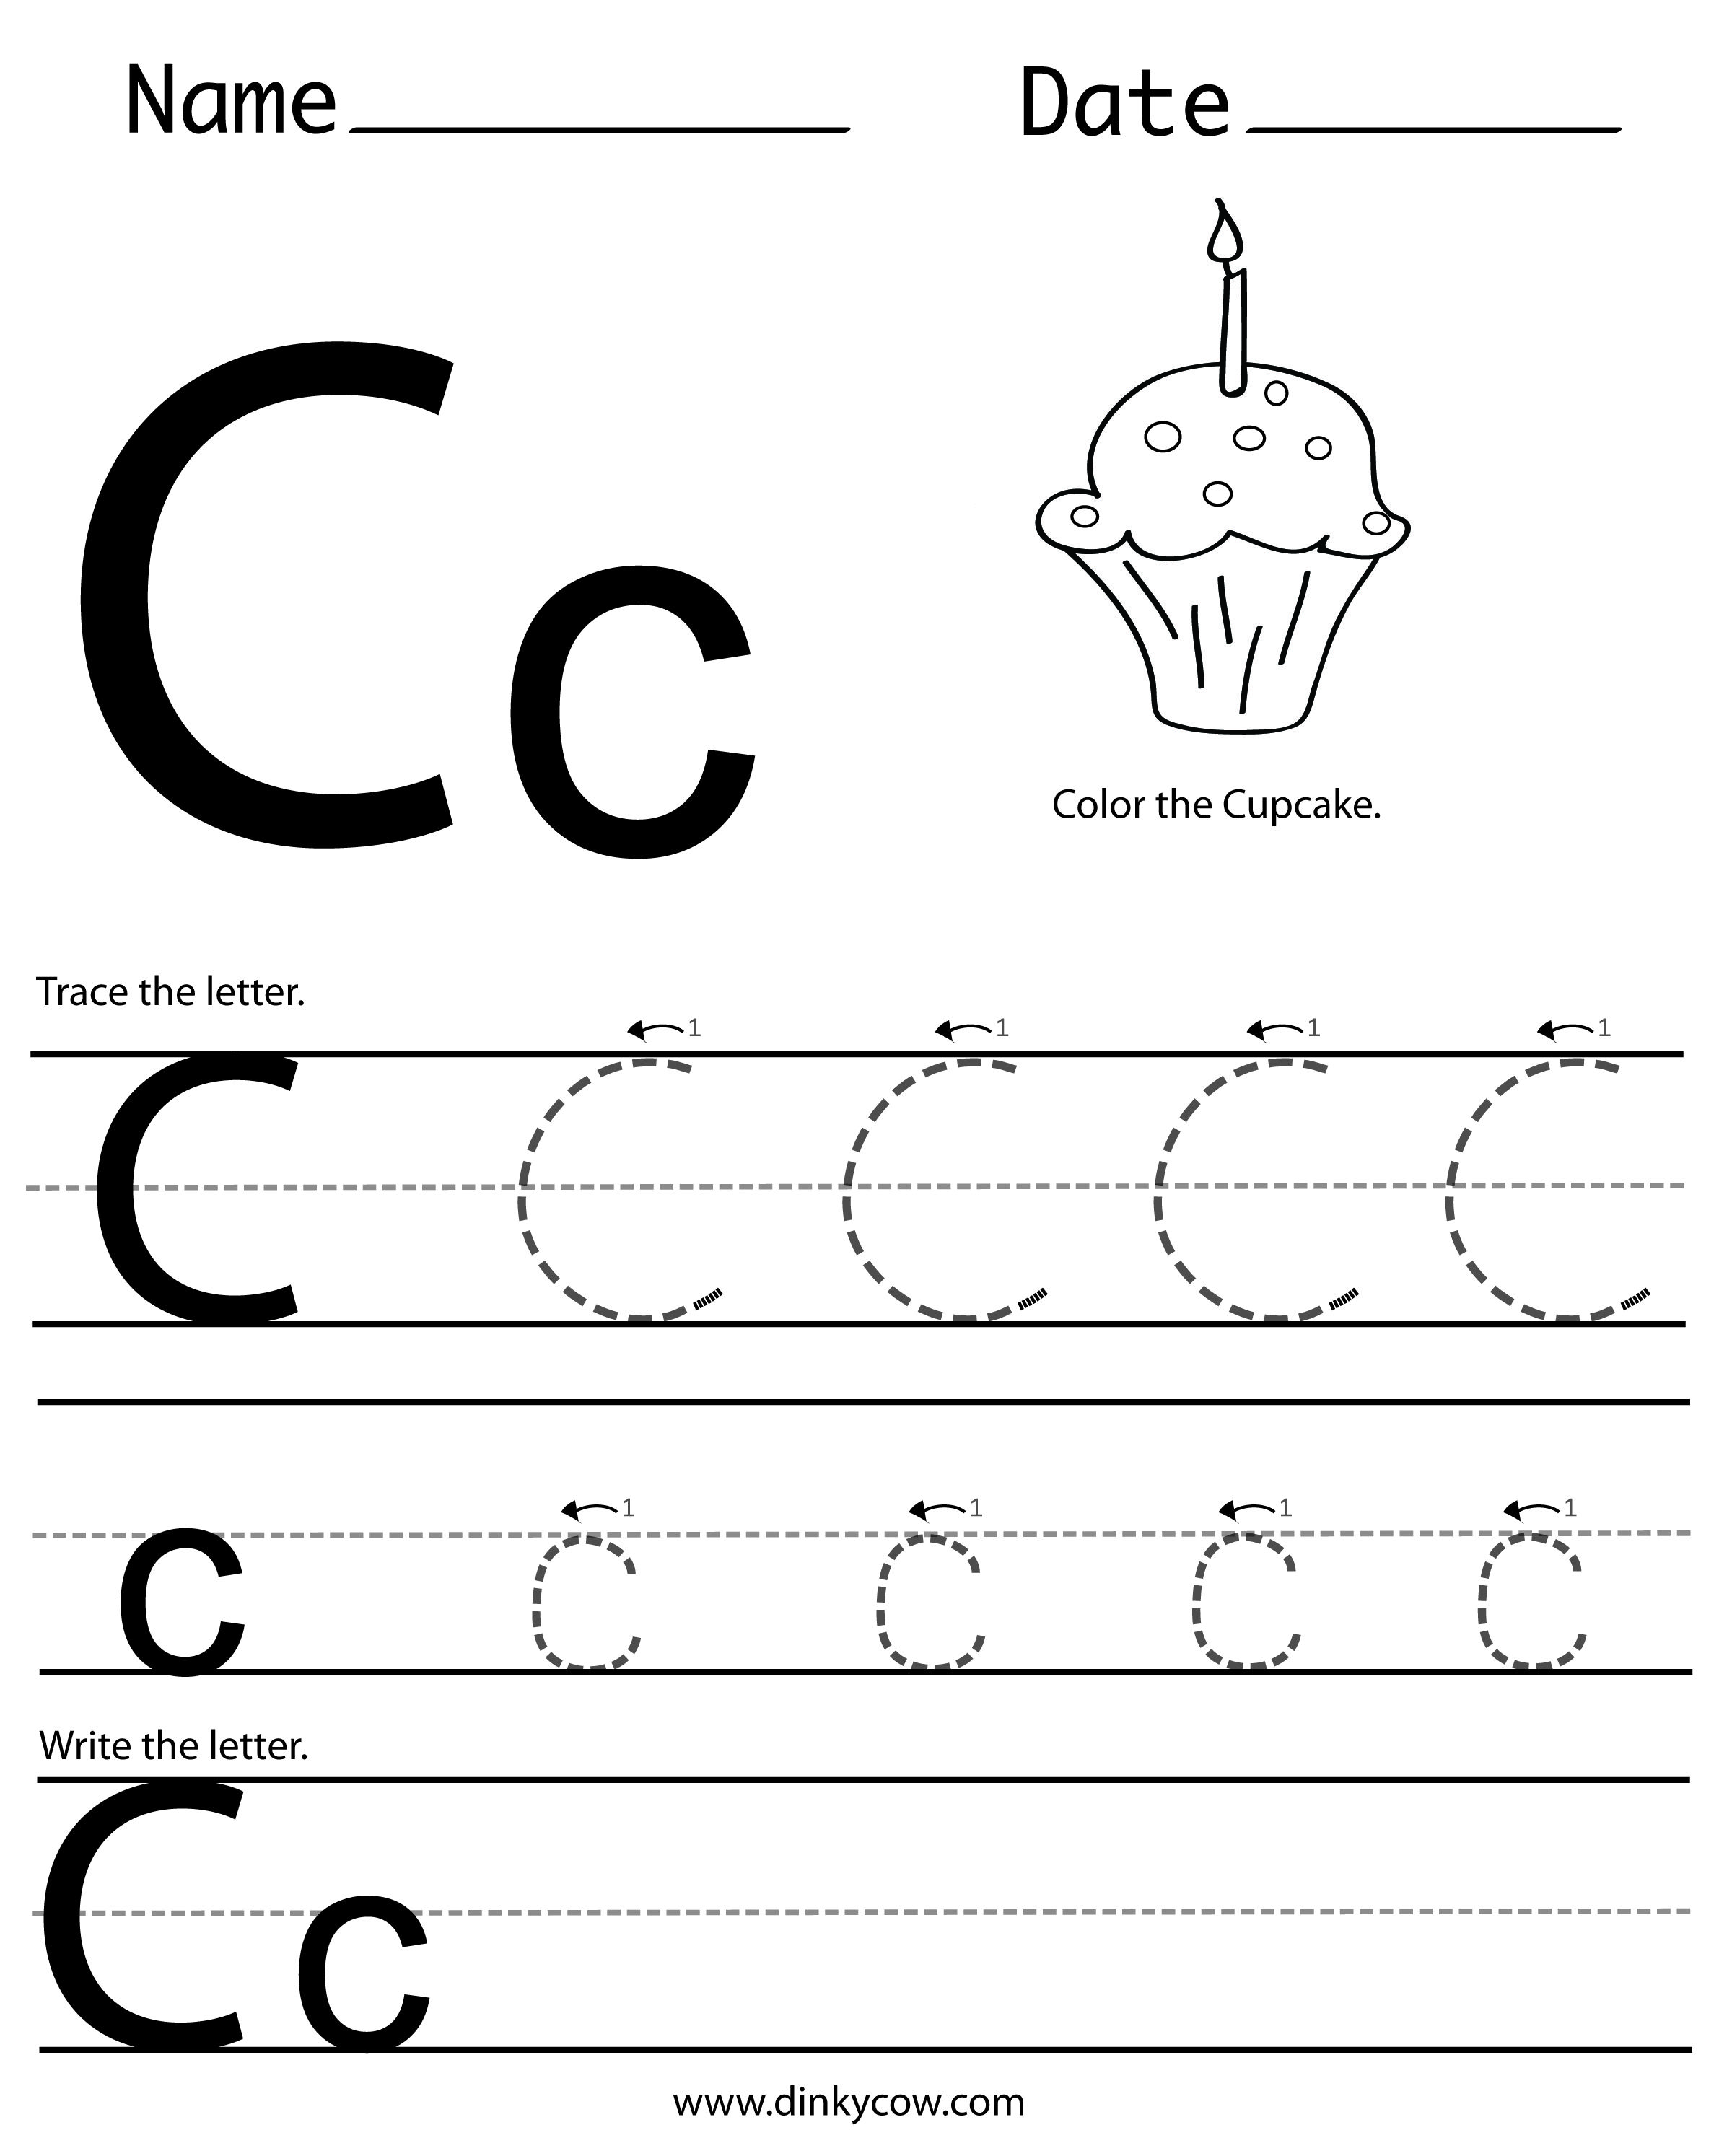 pin by sanaz d on child 39 s education printable preschool worksheets free handwriting. Black Bedroom Furniture Sets. Home Design Ideas